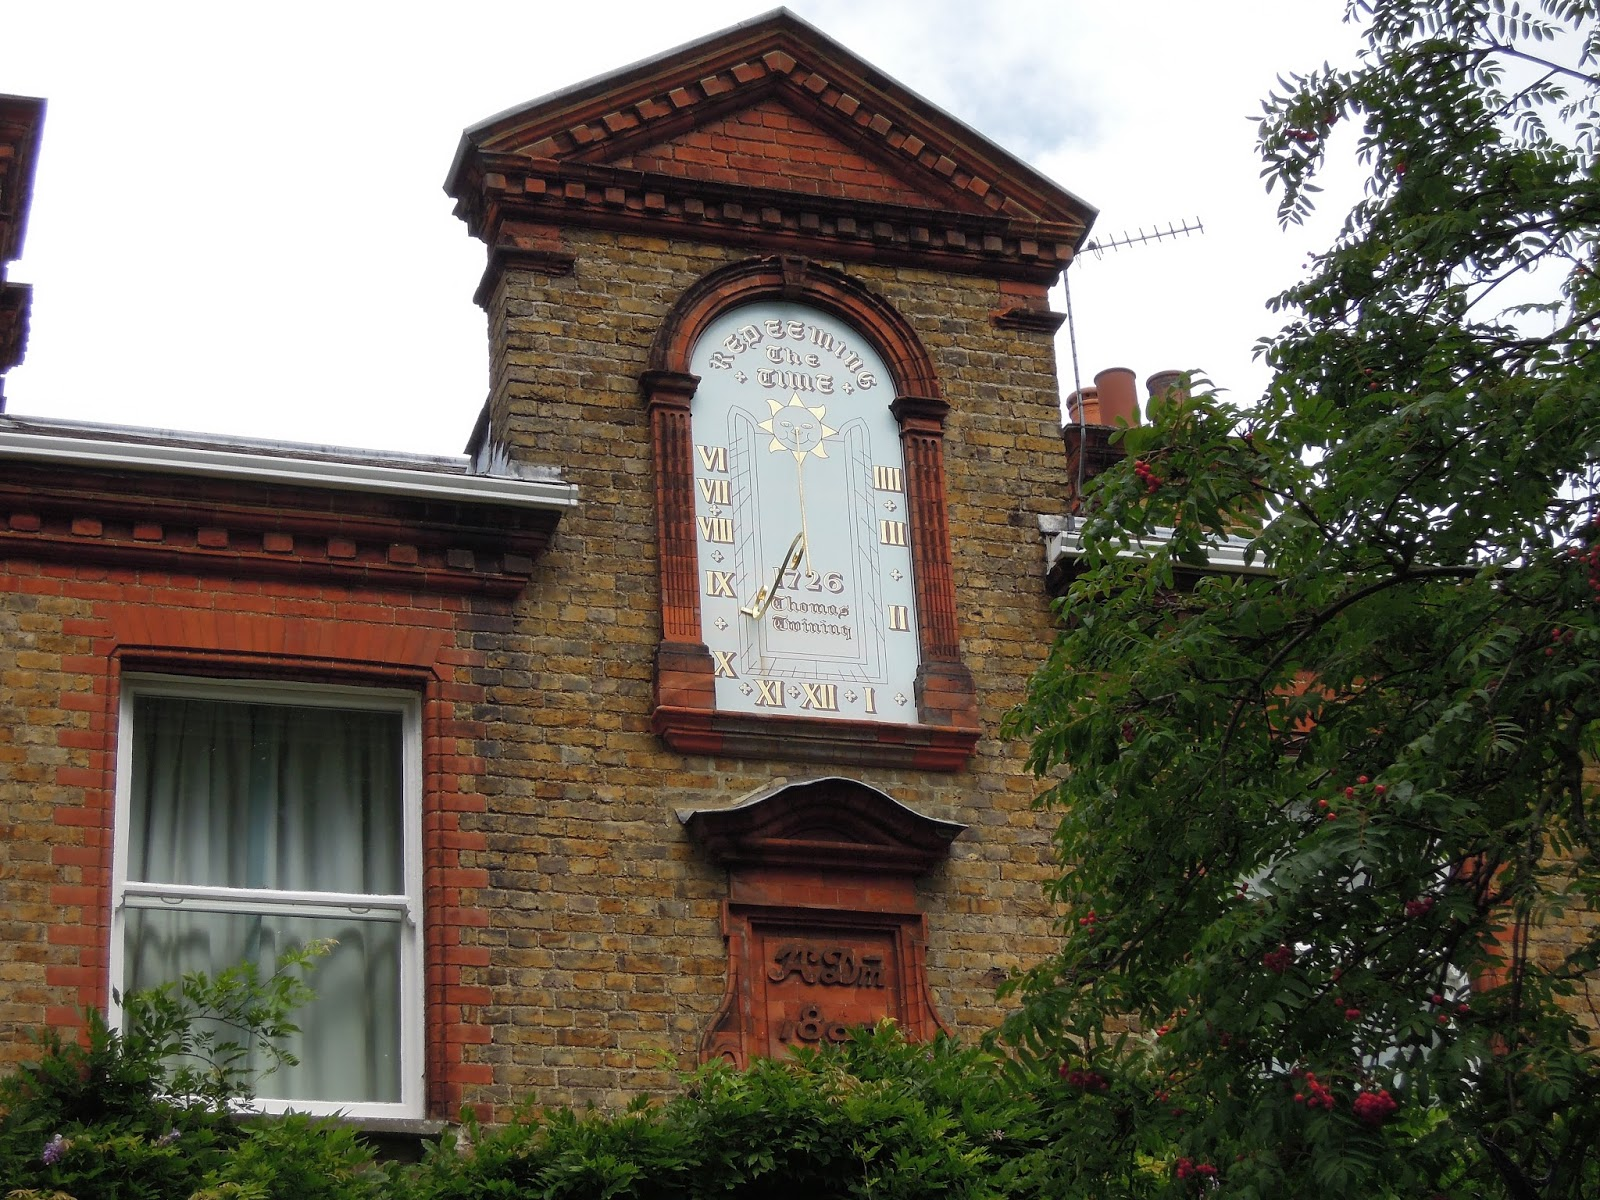 Arcadia on Thames: Teddington to Putney cycle circuit | Cycle Geography